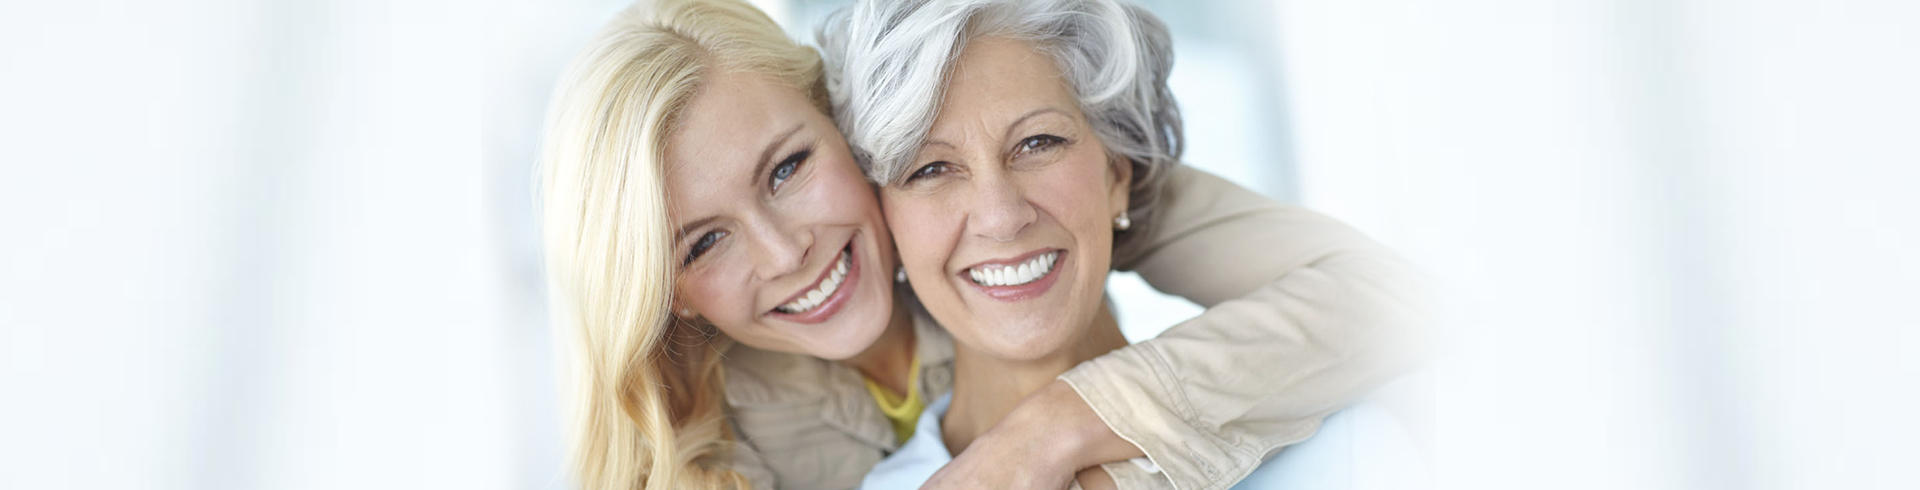 Causes of Periodontitis